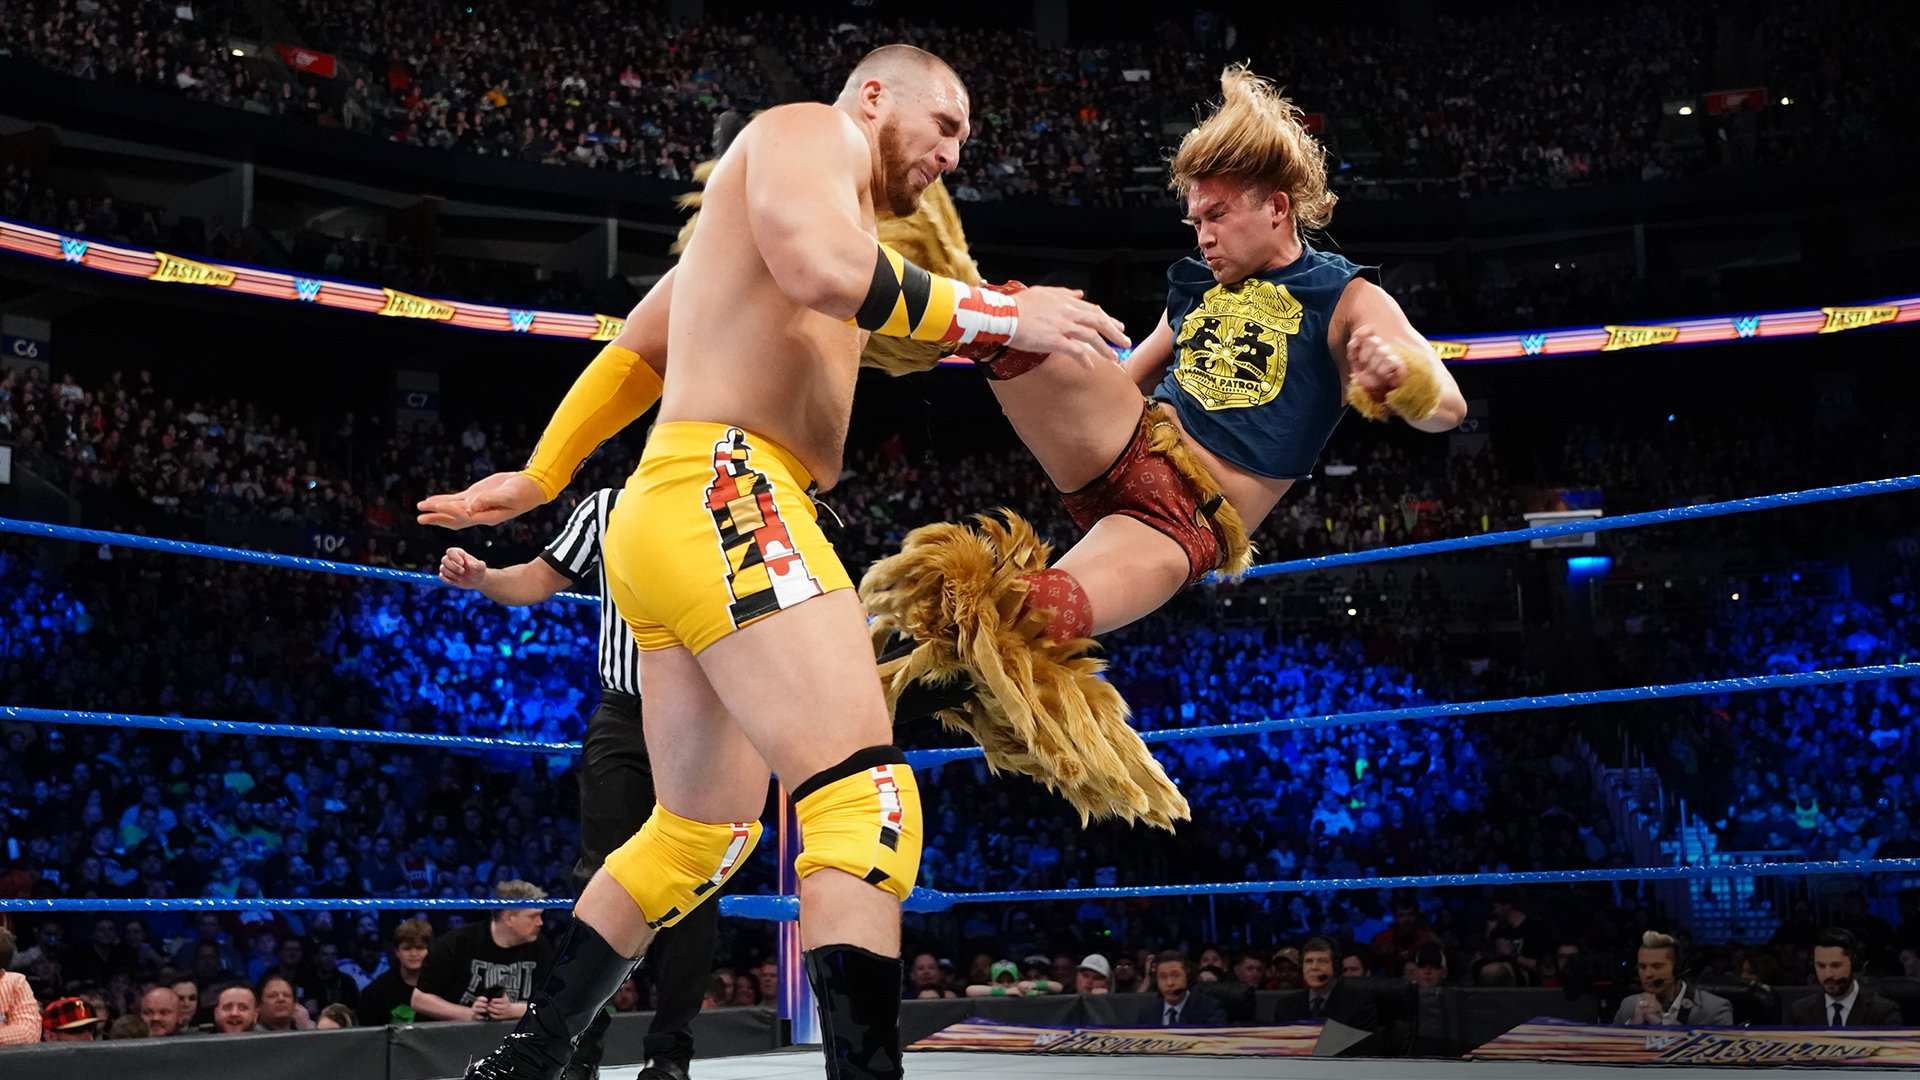 Chad Gable taunts Tyler Breeze: WWE Fastlane 2018 Kickoff Match | WWE